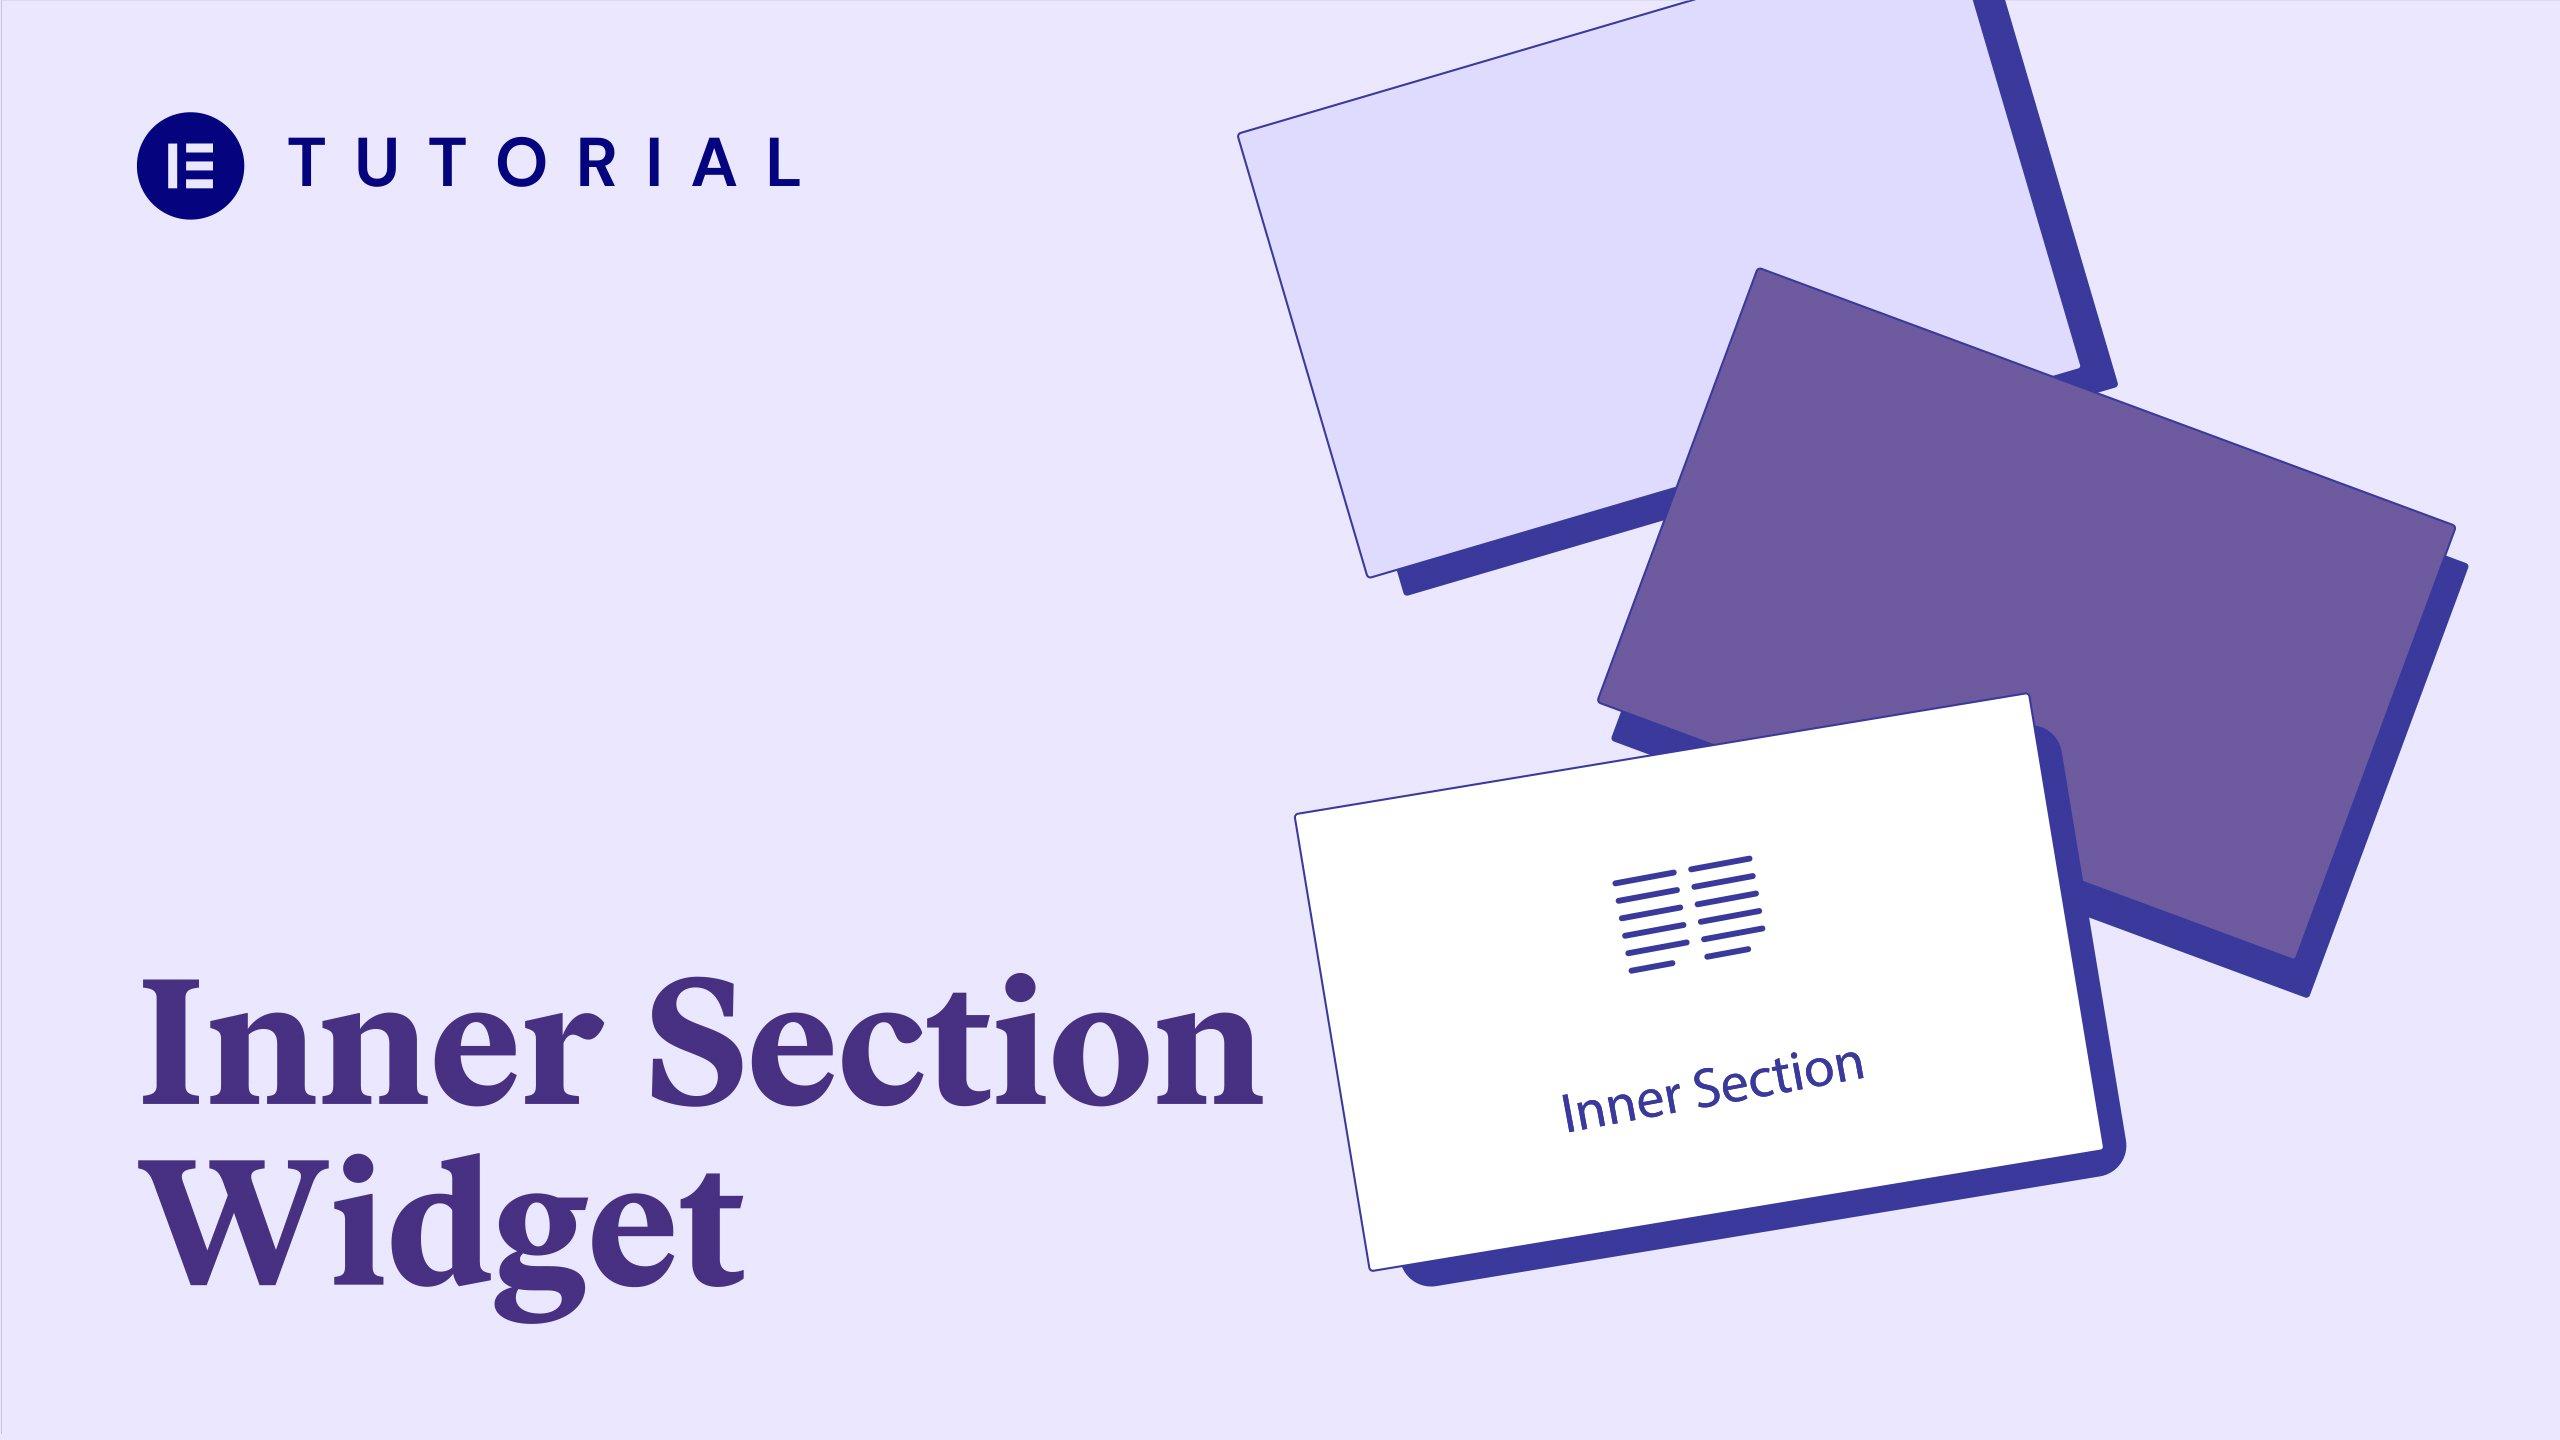 inner section widget